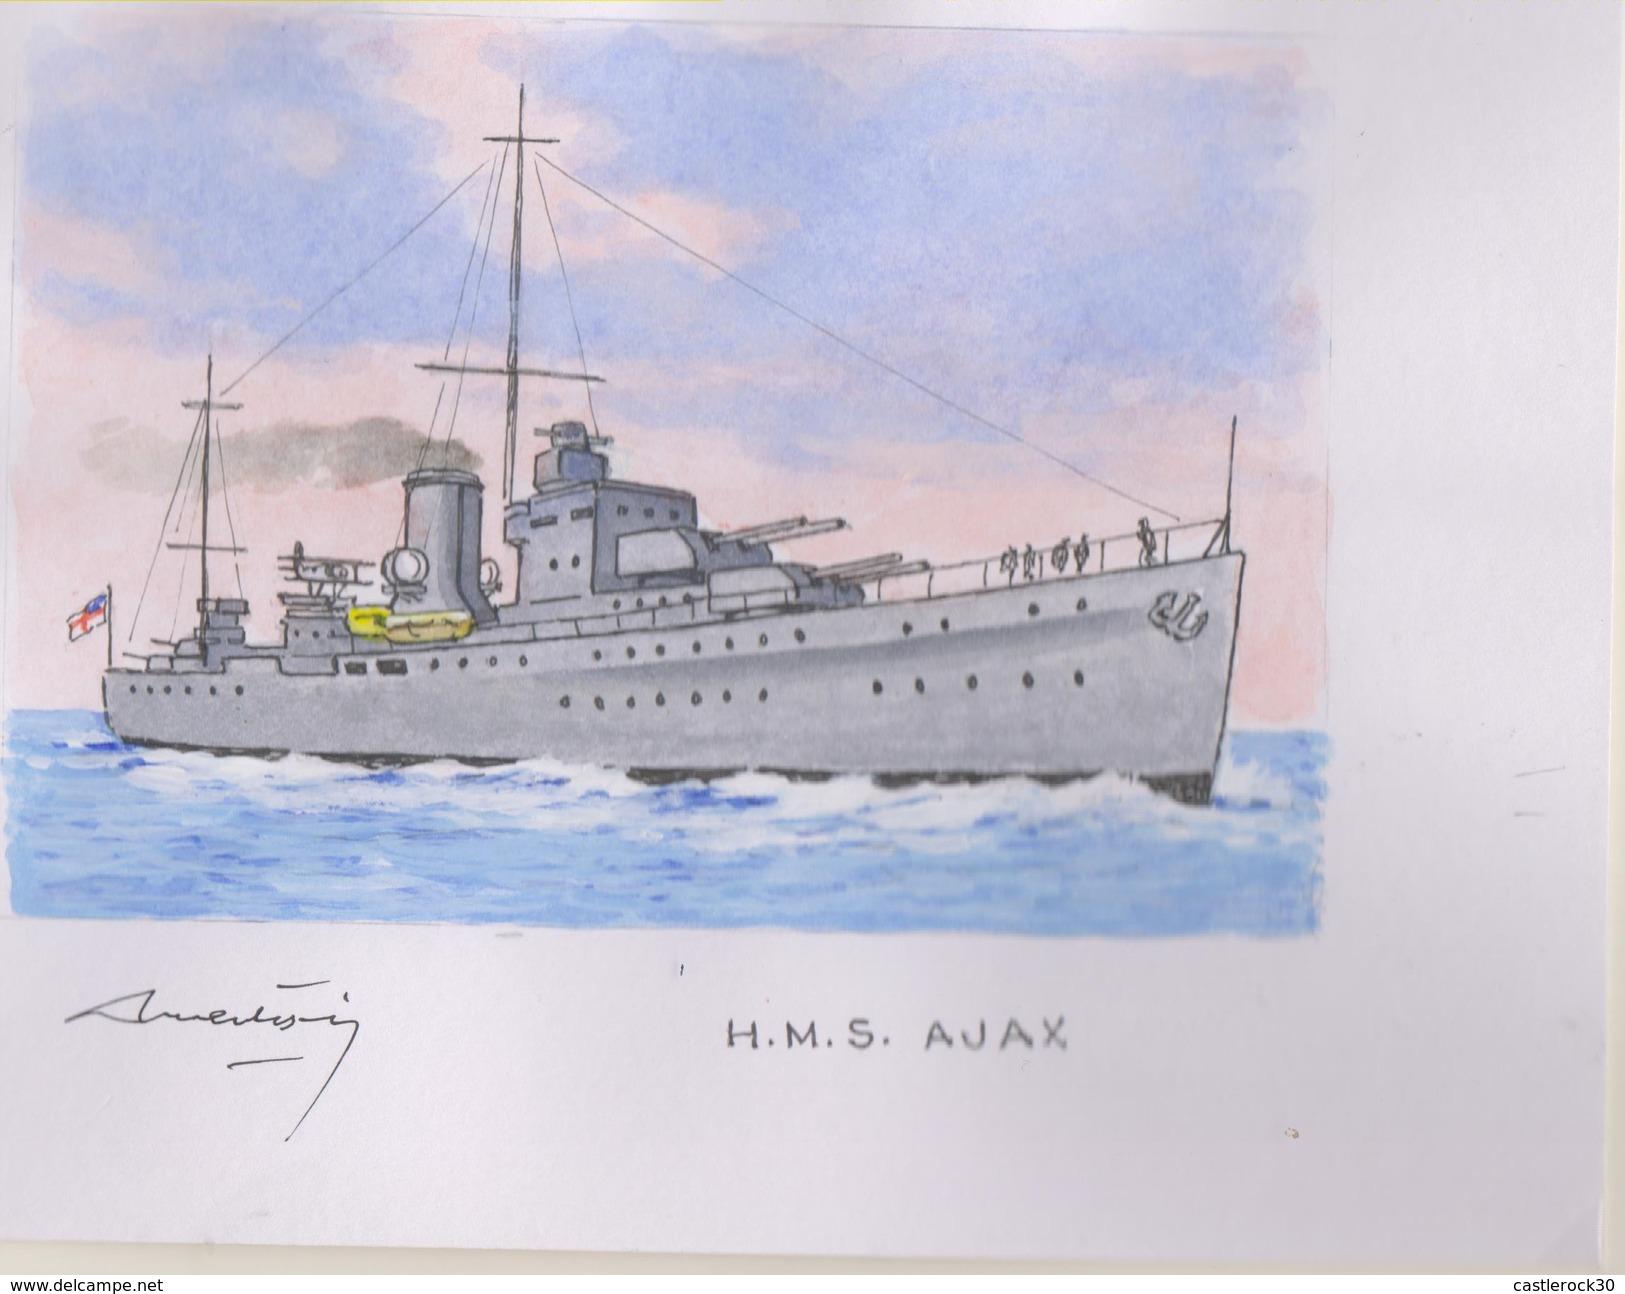 O) 2009 URUGUAY, ORIGINAL ART WORK DESIGNES, ALL OF THE WERE ISSUED ON STAMPS SCOTT 2284, LIGHT CRUISE HMS AJAX, BATALLA - Uruguay